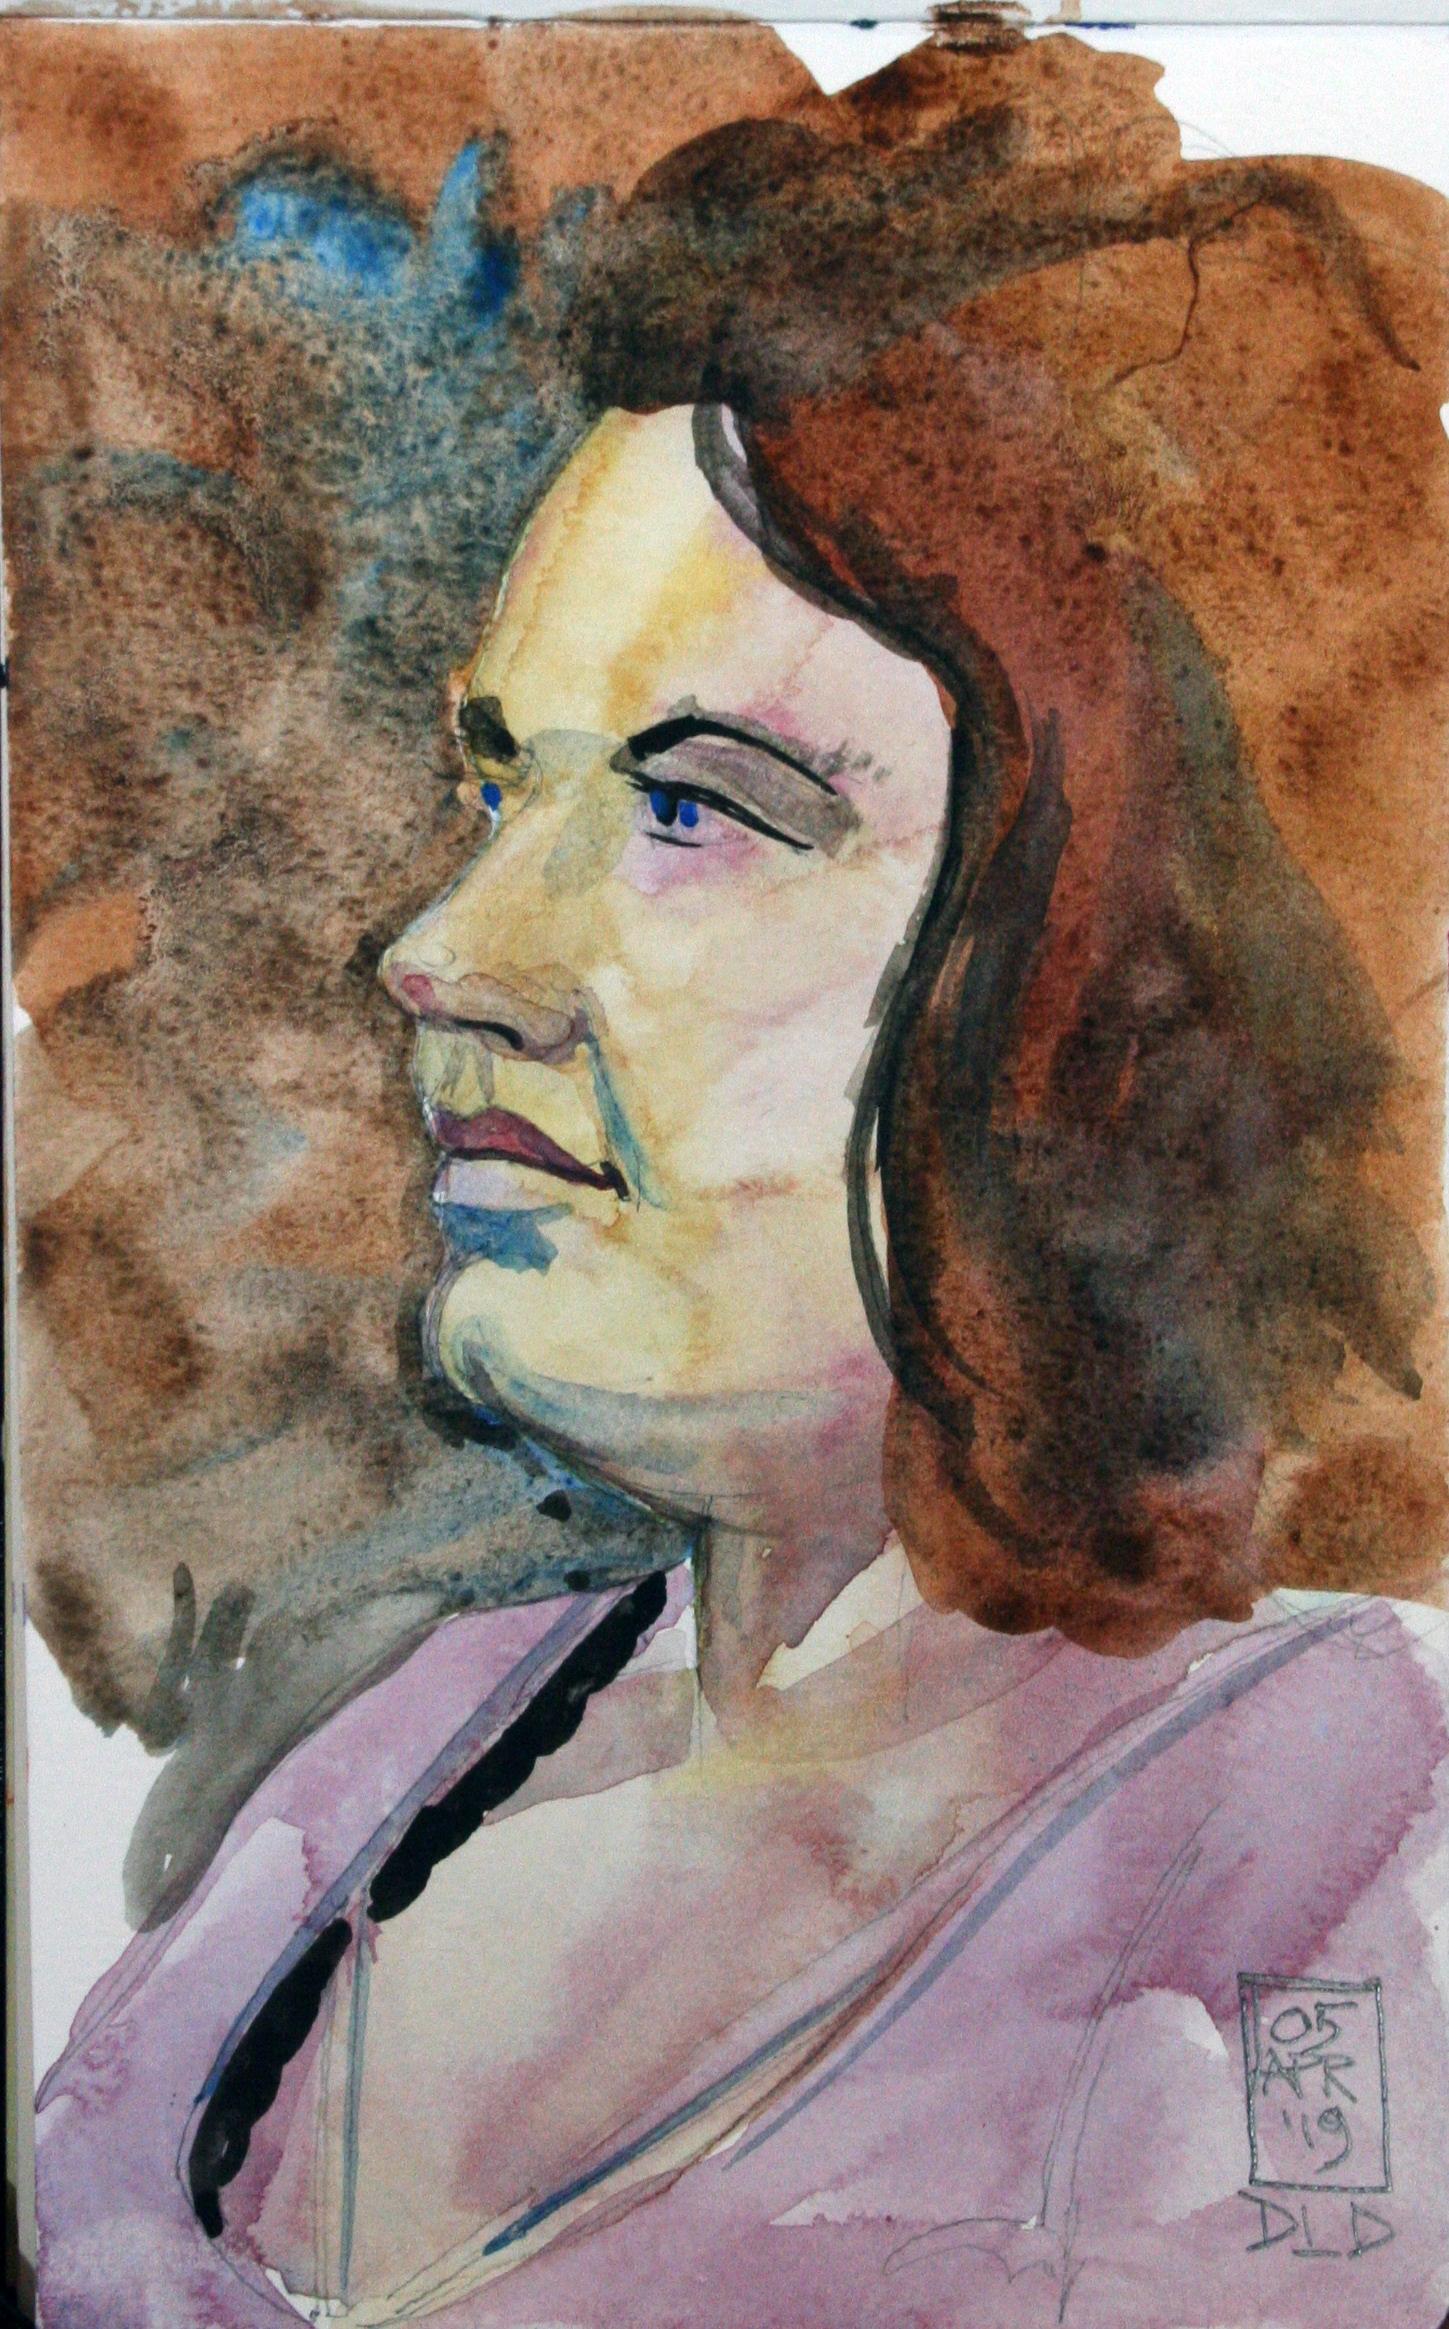 Duane Dickson did this watercolor.